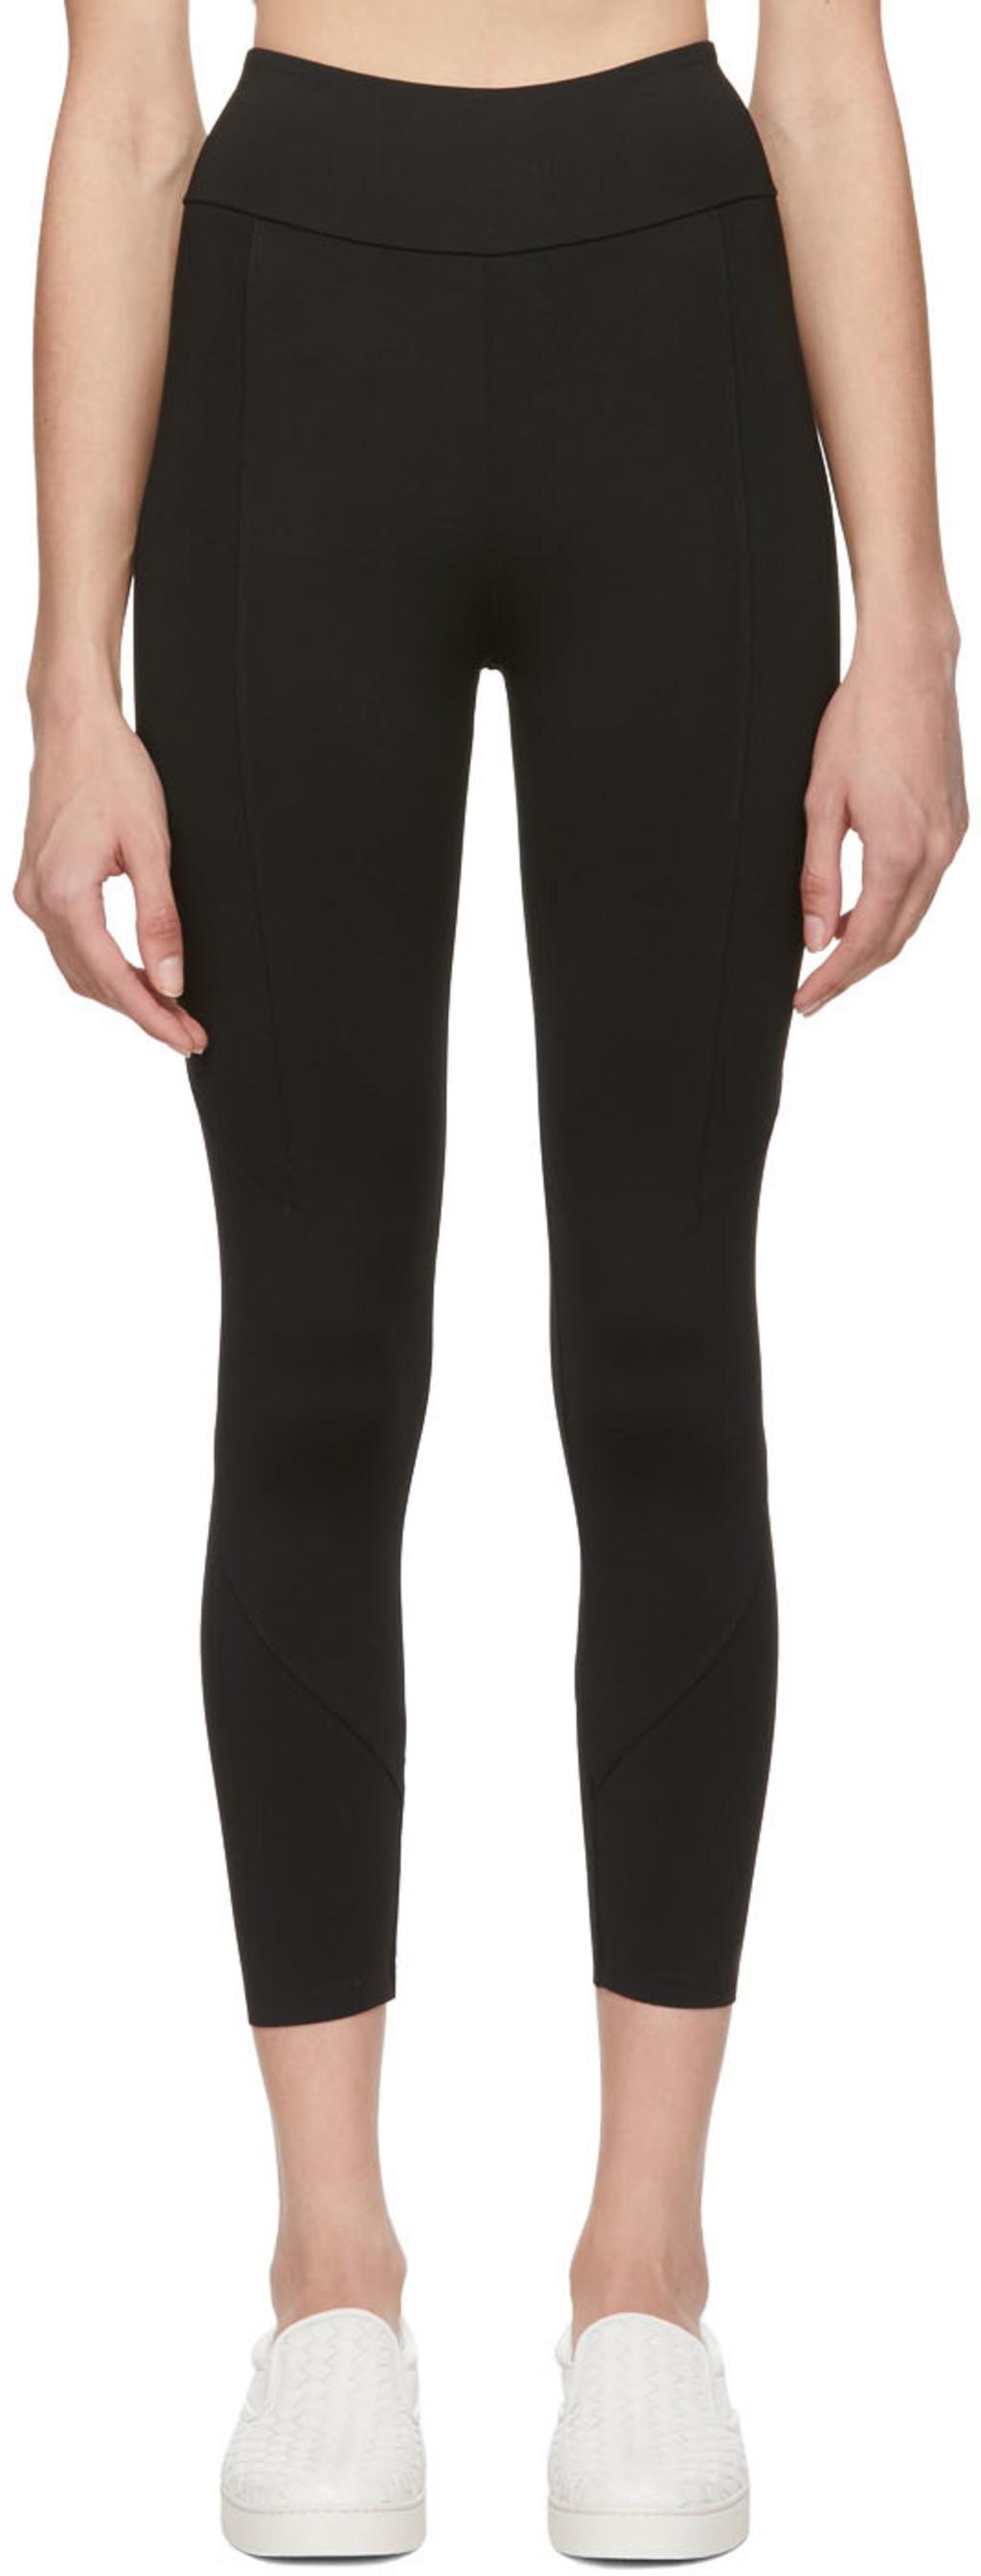 c6028bf92a Designer pants for Women